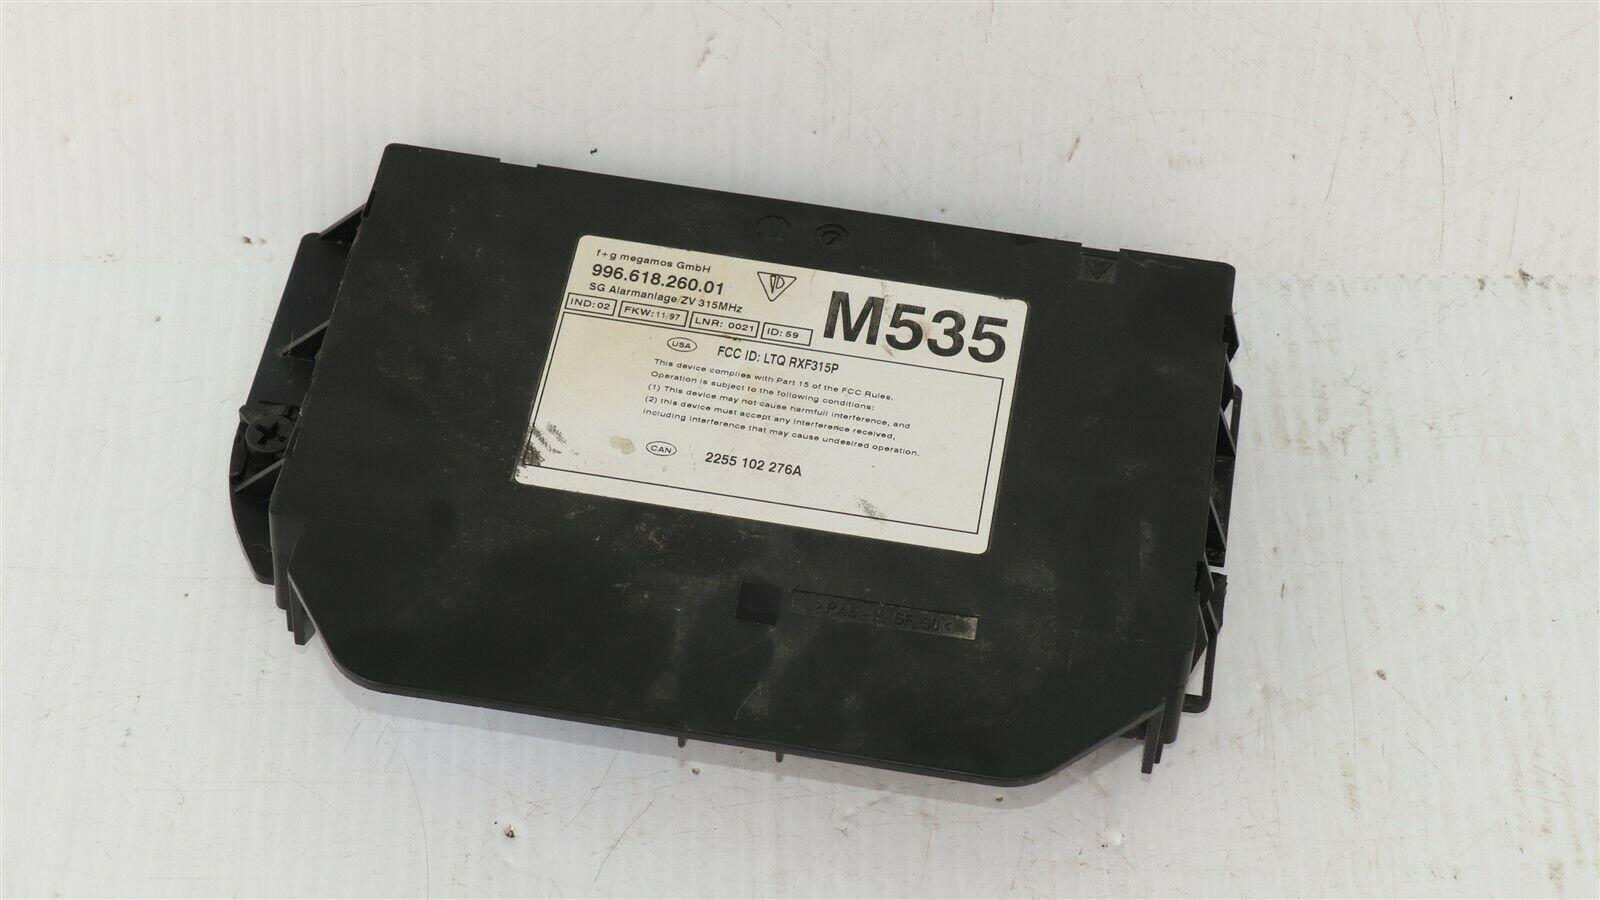 Porsche 986 Boxster Anti Theft Alarm Control Module Immobilizer 996.618.262.01